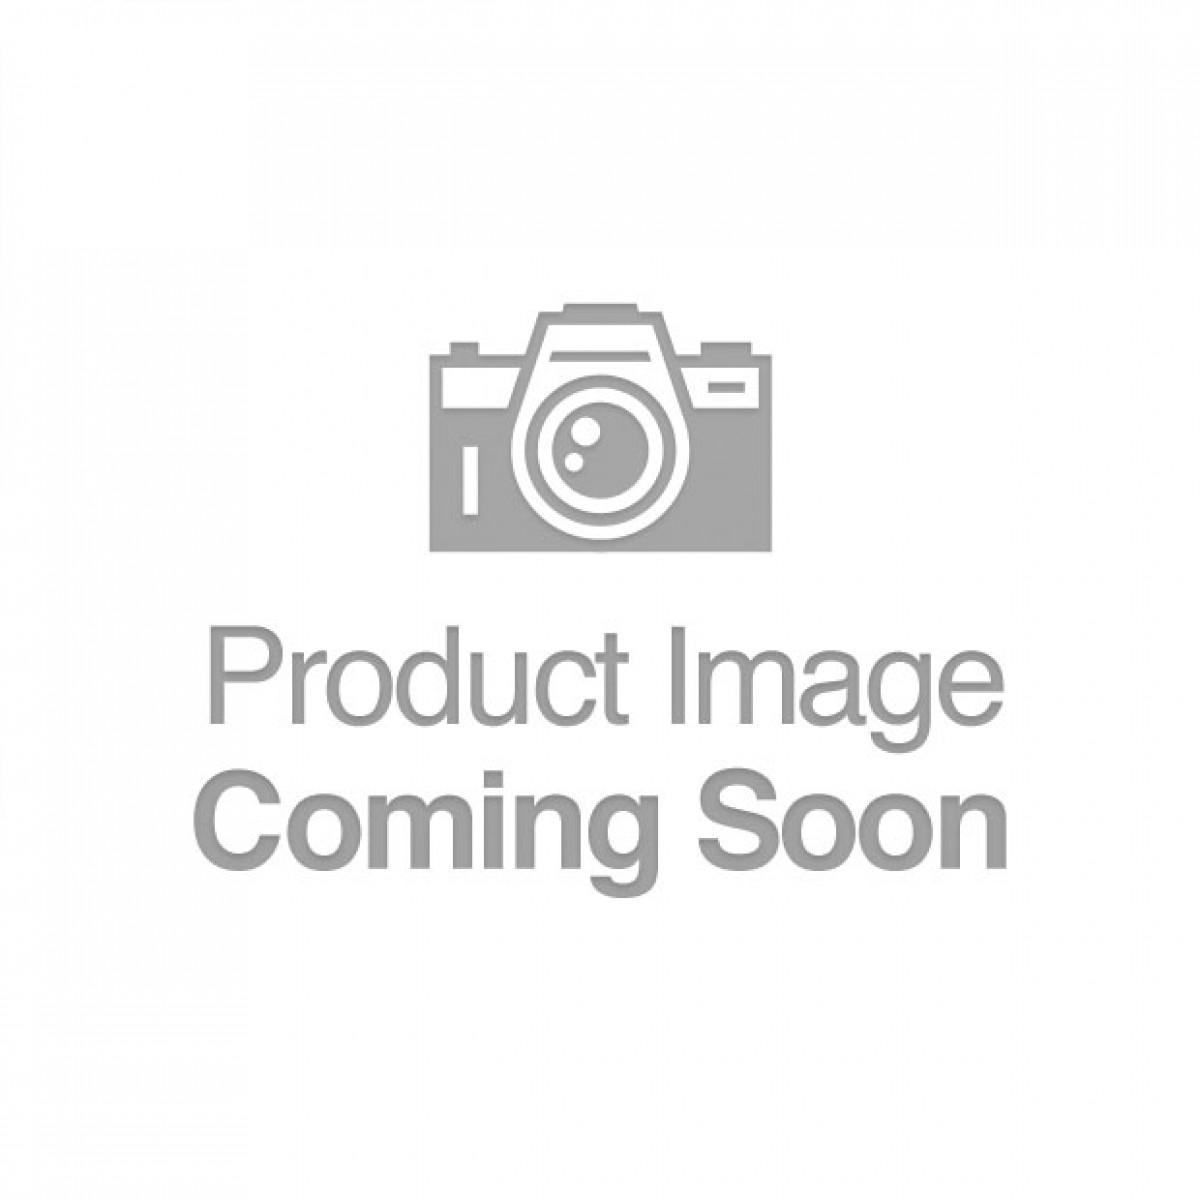 Adam & Eve Silicone G Spot Pleaser Rechargeable Dual Stim - Purple